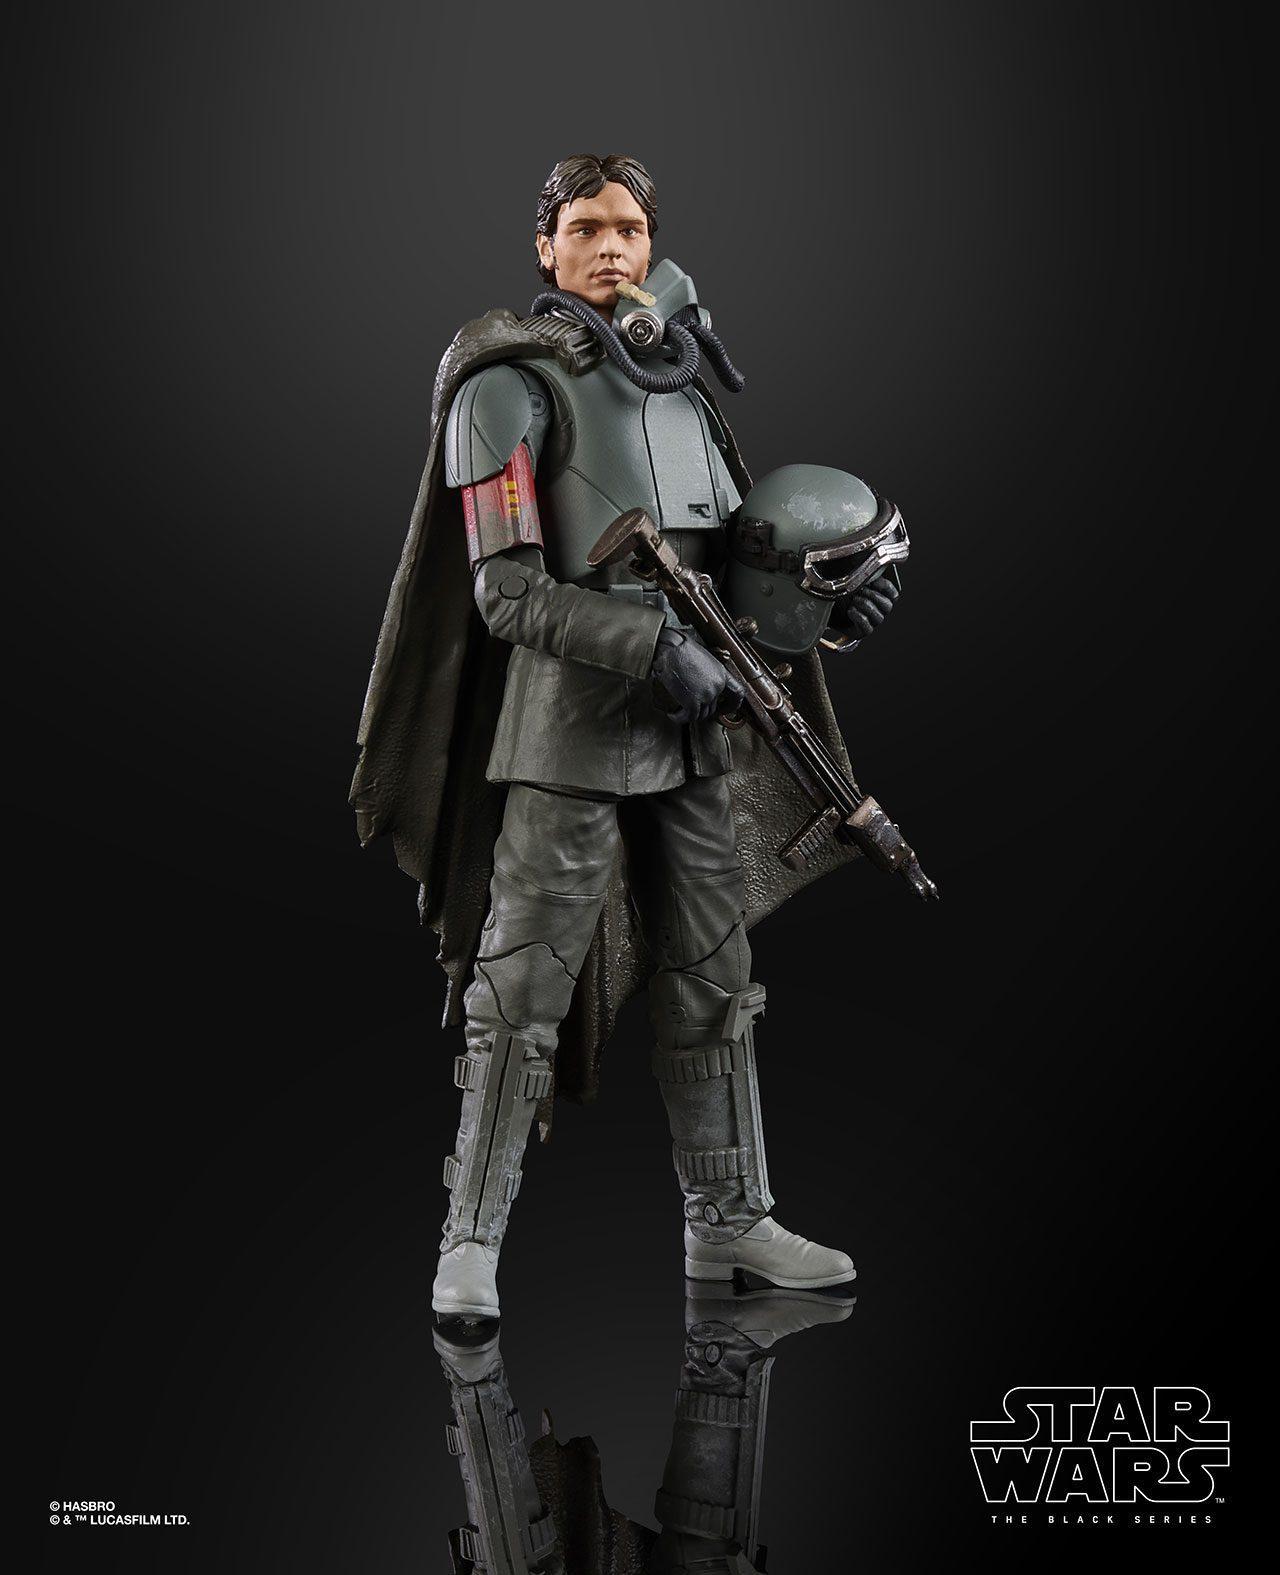 STAR WARS THE BLACK SERIES FIGURE Han Solo Mimban (2)